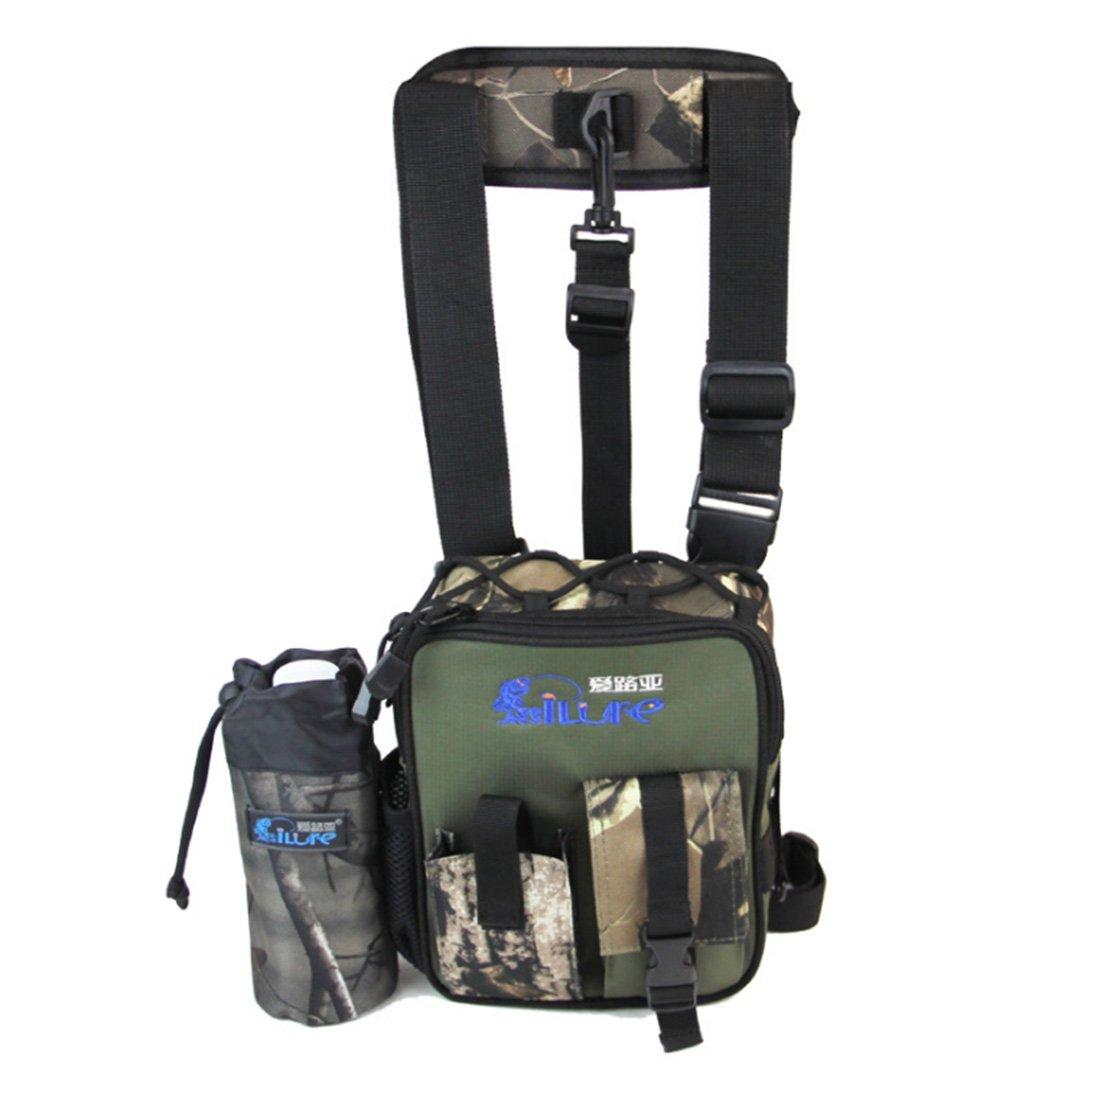 Al aire libre Multi Función bolsa de pesca bolsa de cintura Pierna Bolsa impermeable bolsa de aparejos de pesca, Negro Ilure